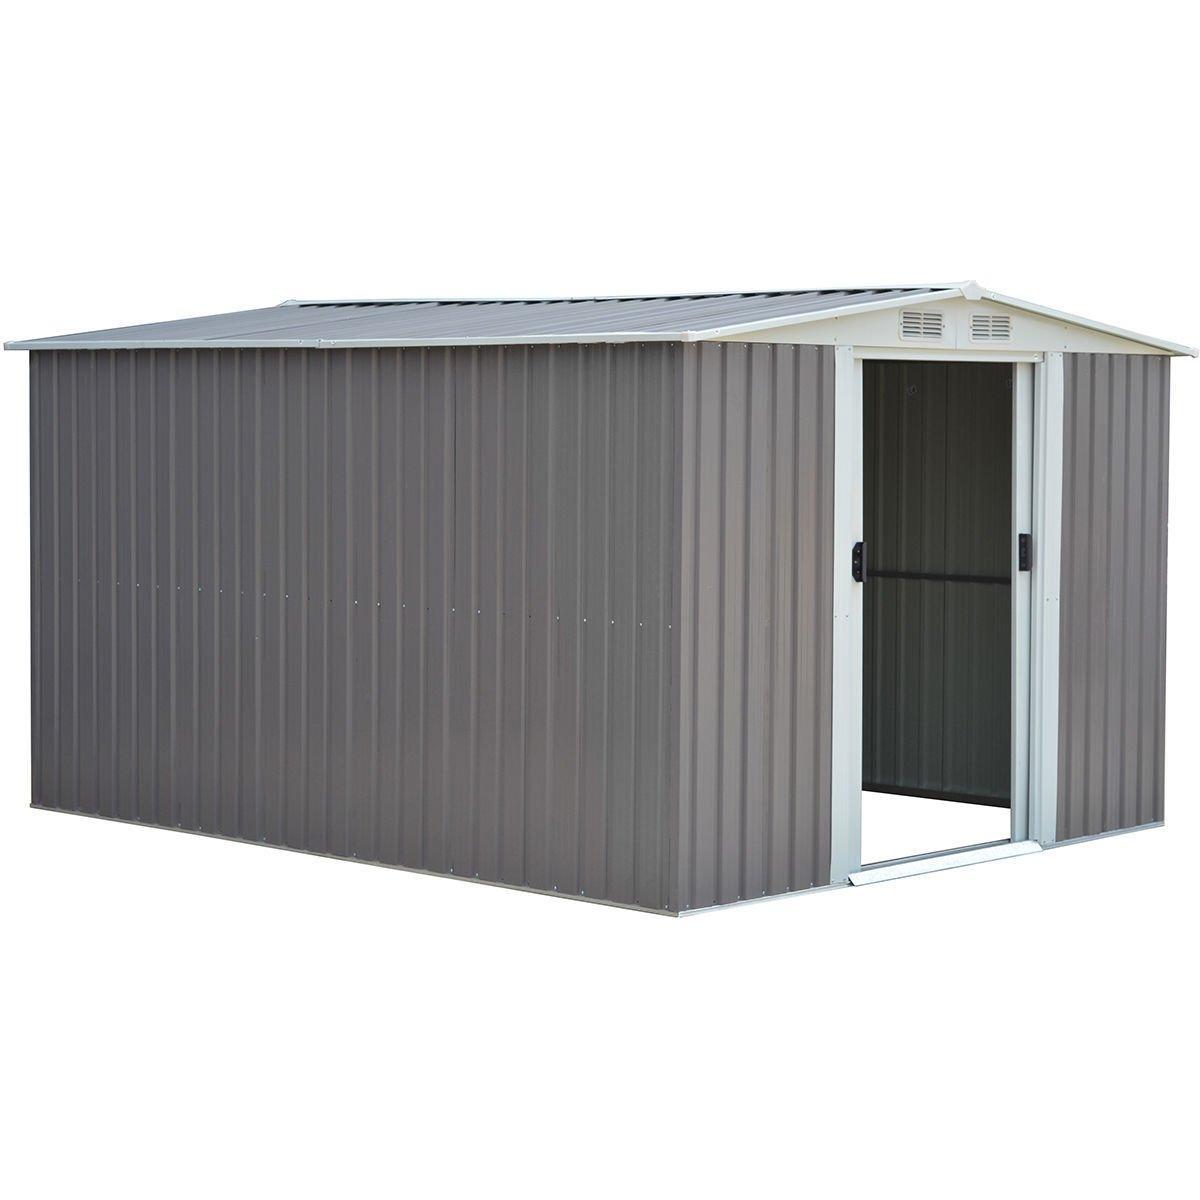 New 10 x 8FT Garden Storage Shed Tool House Sliding Door Galvanized Steel Gray